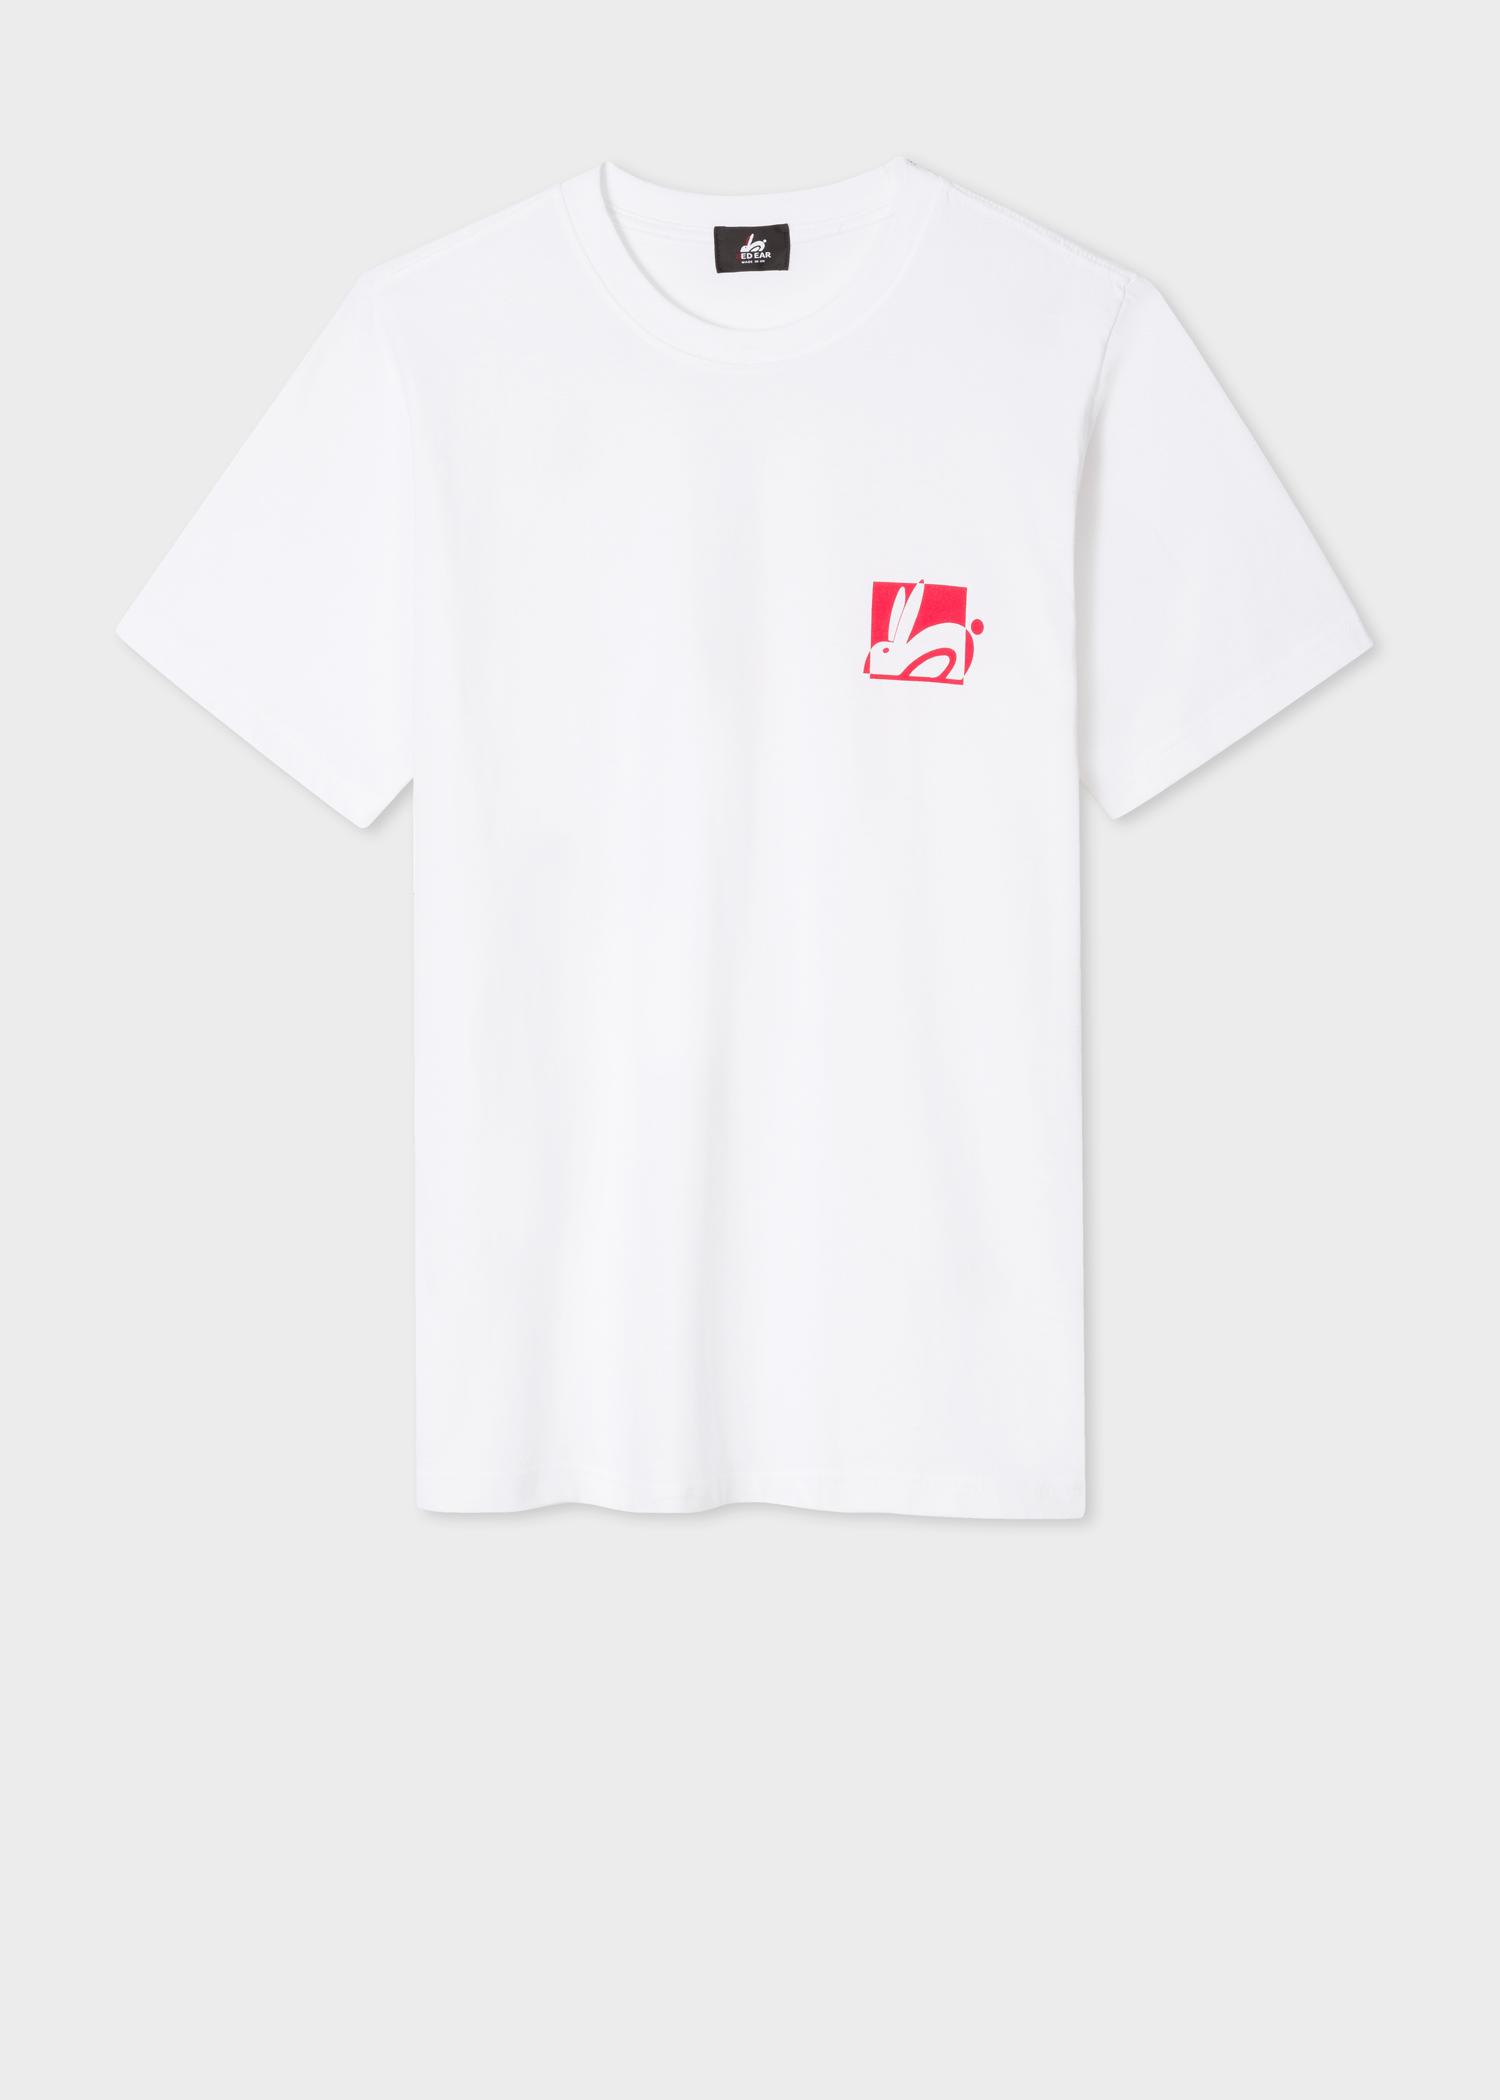 a17bd1bf5de Front view - Men's White Small Rabbit Logo Print Red Ear T-Shirt Paul Smith